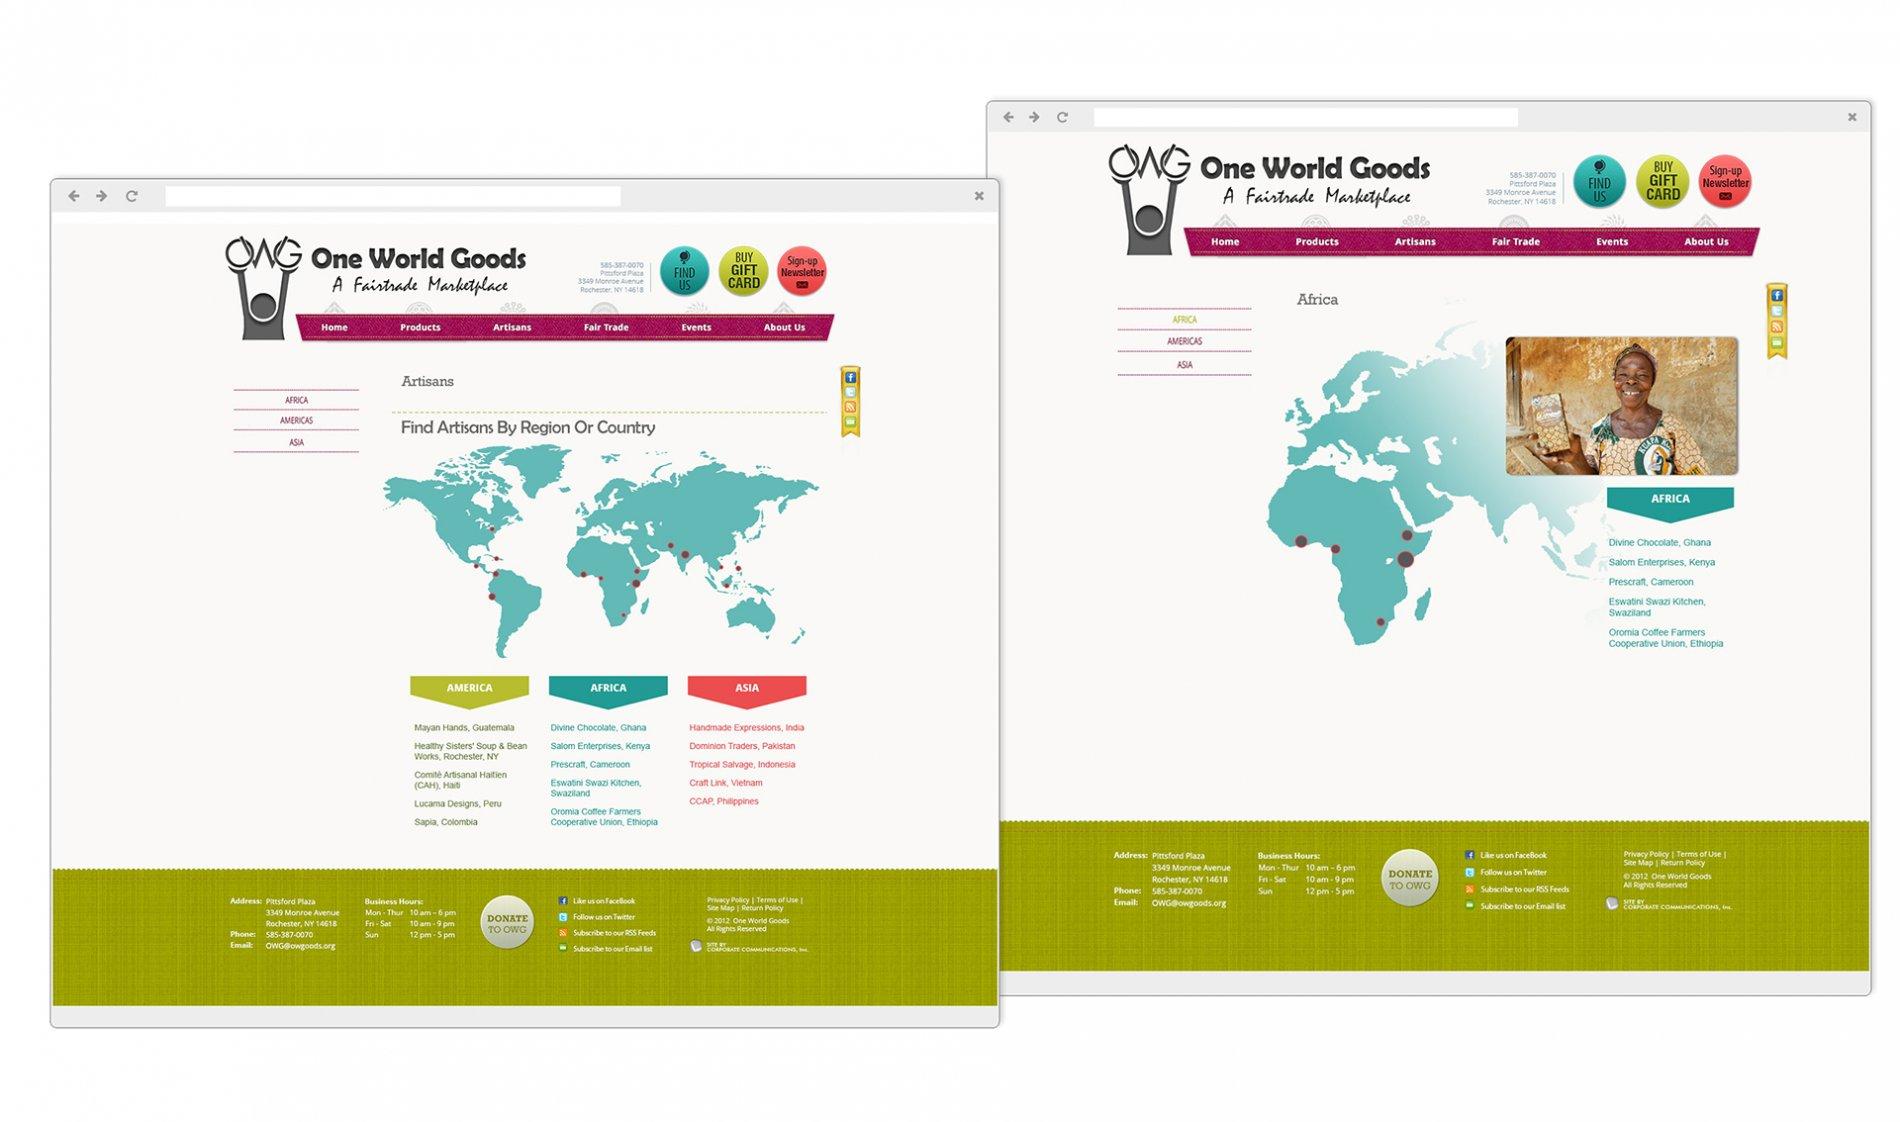 One World Goods Website Artisans Page